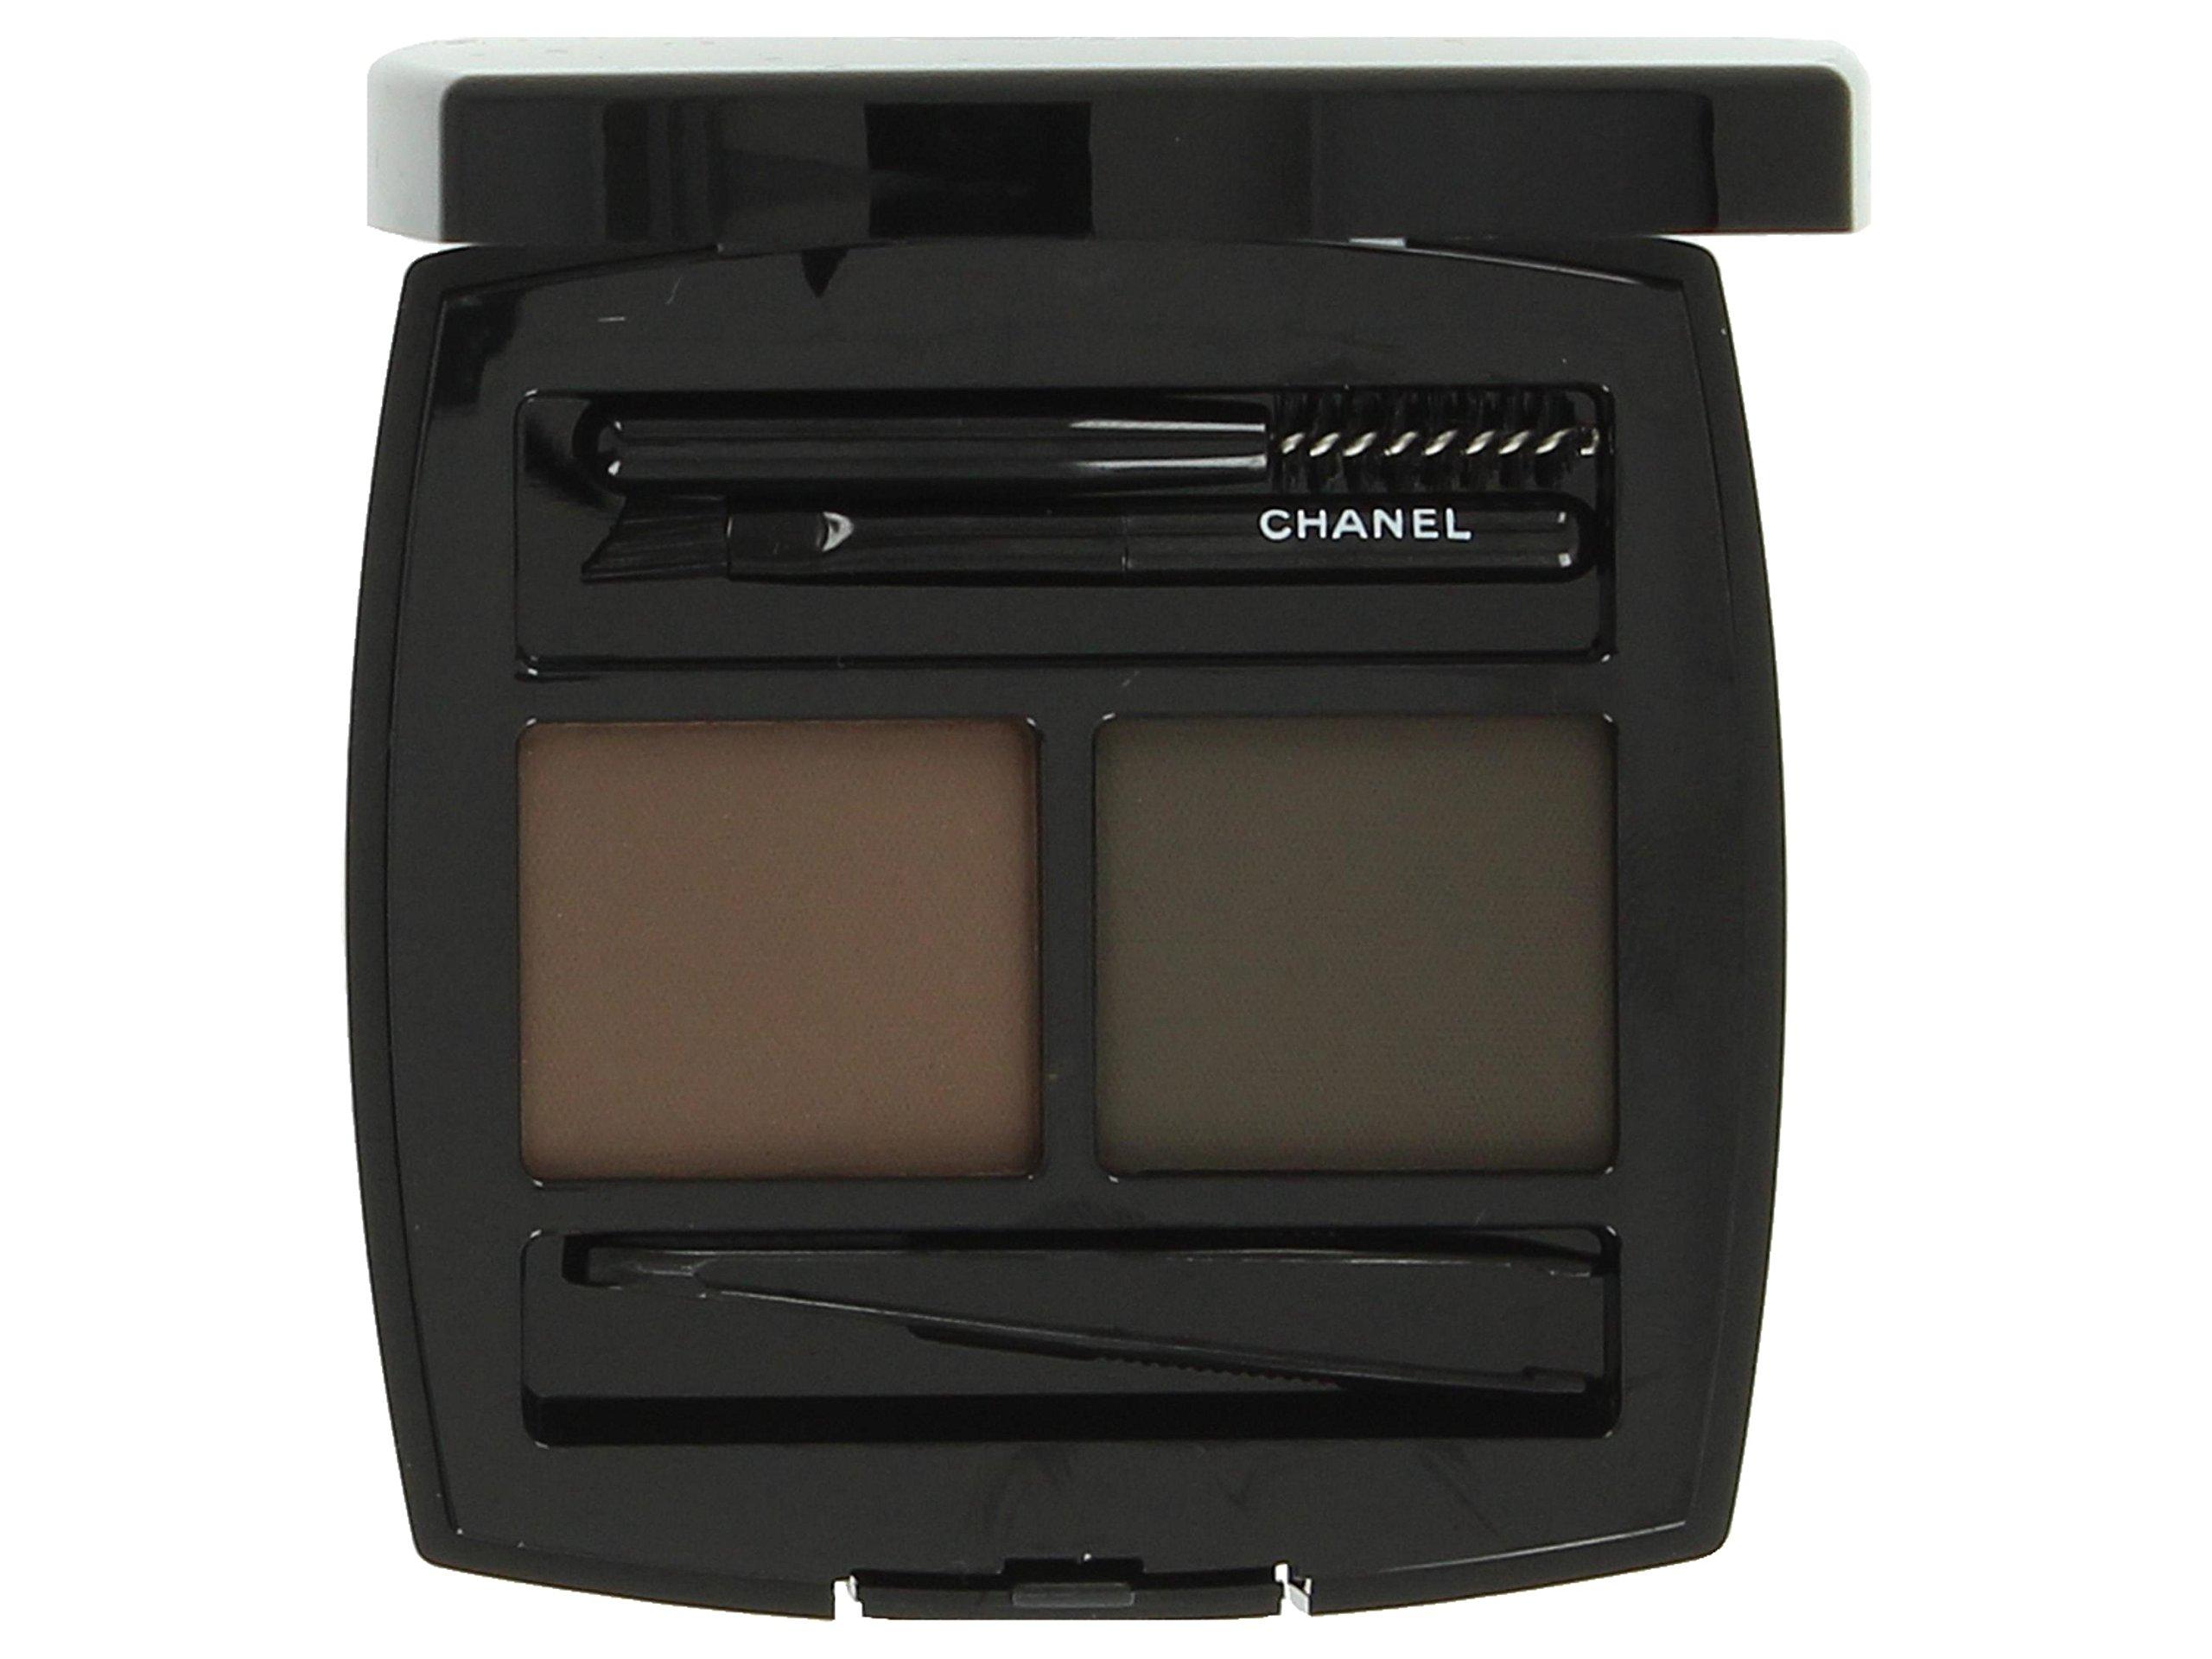 Chanel La Palette Sourcils De Chanel Brow Powder Duo 50 Brun for Women Powder, 0.14 Ounce by CHANEL